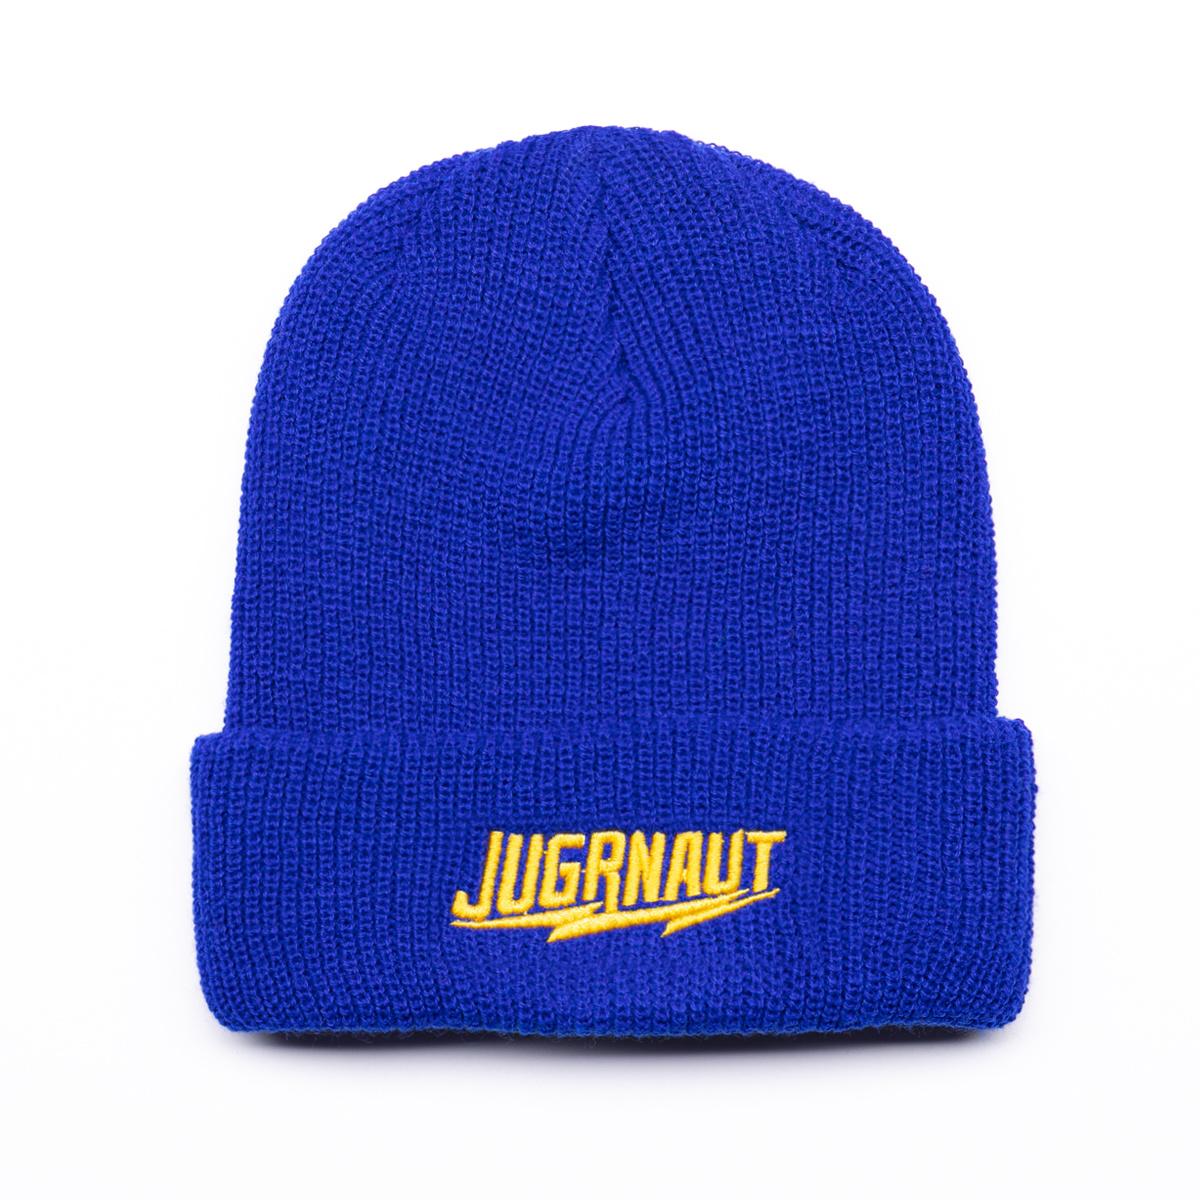 Jugrnaut Jugrnaut Panthro/Script Ribbed Beanie Royal Blue